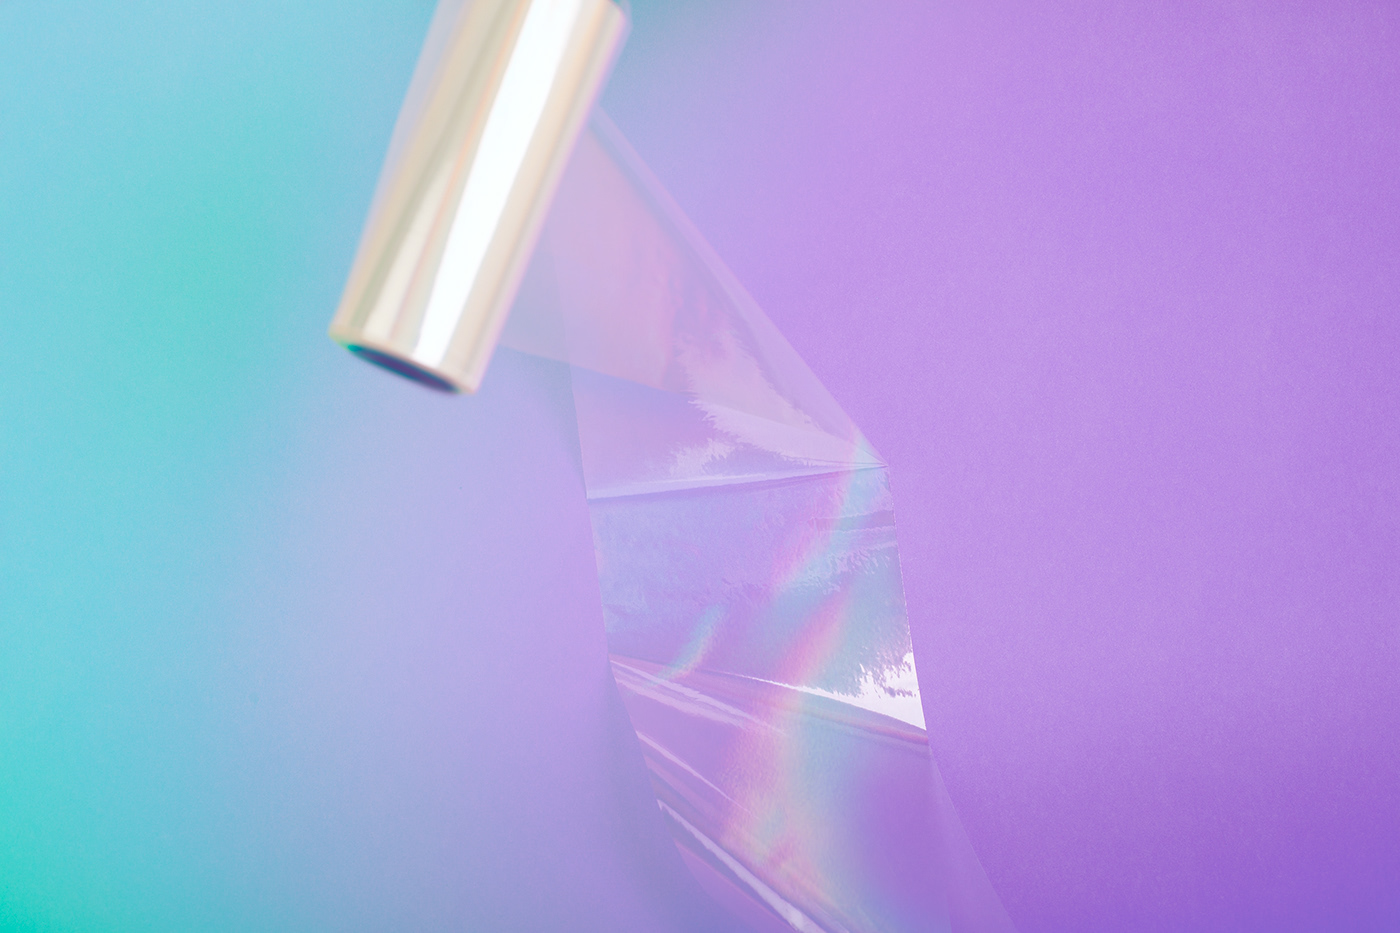 beco   personal branding identity holographic Stationery studio